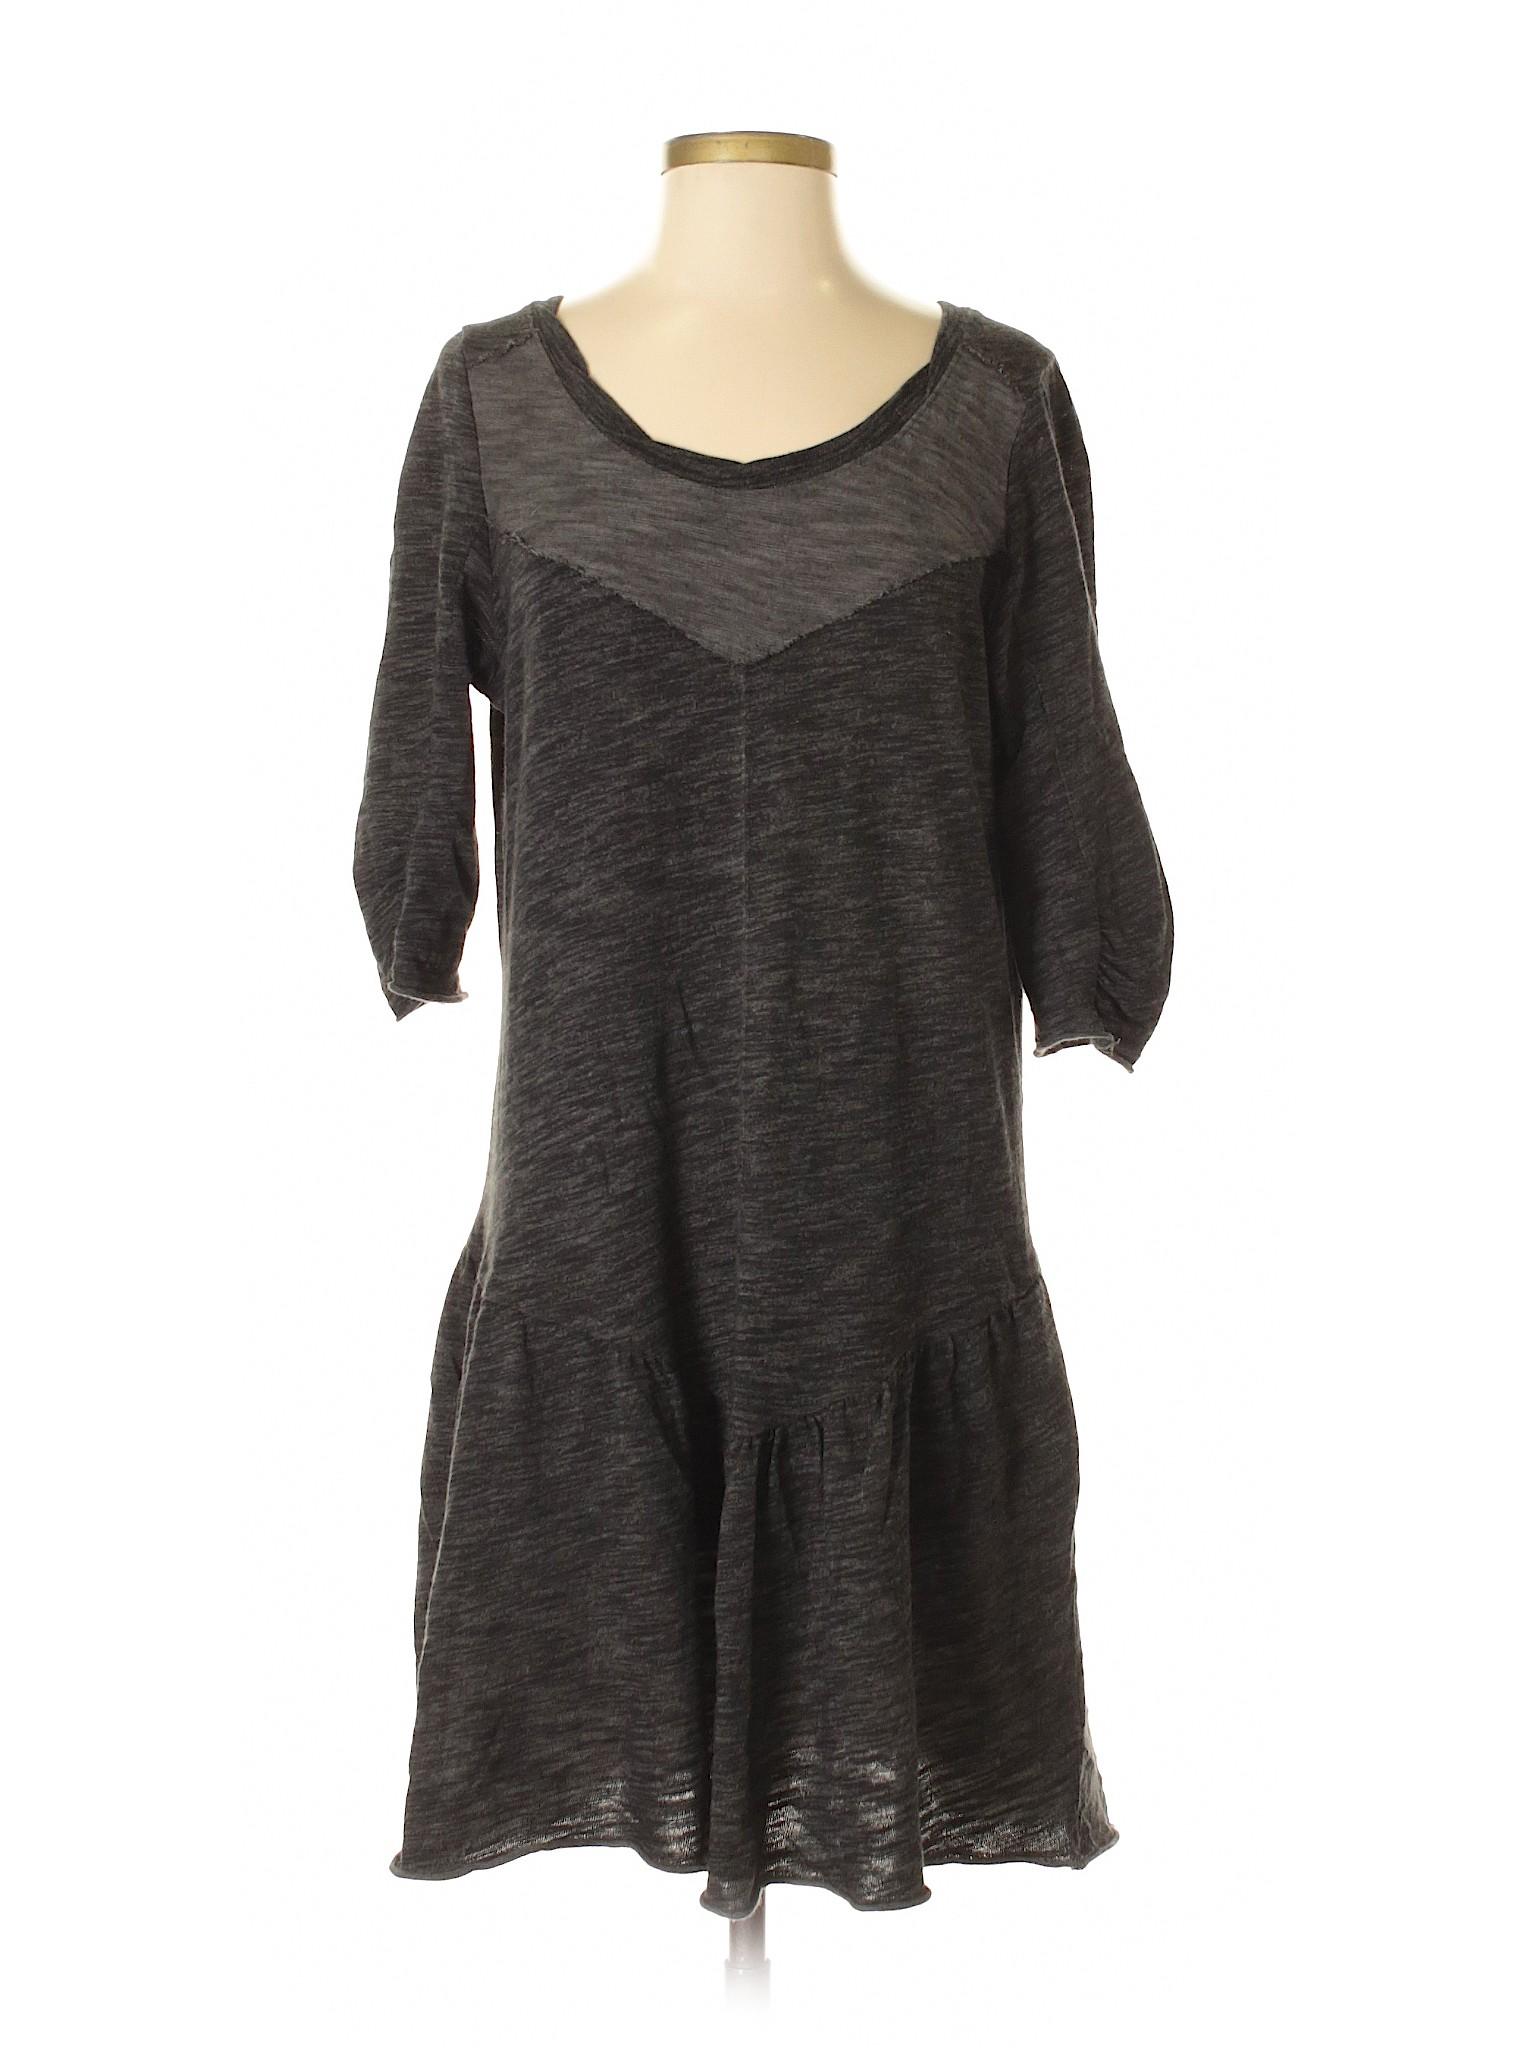 FP Dress BEACH winter Boutique Casual Zq541